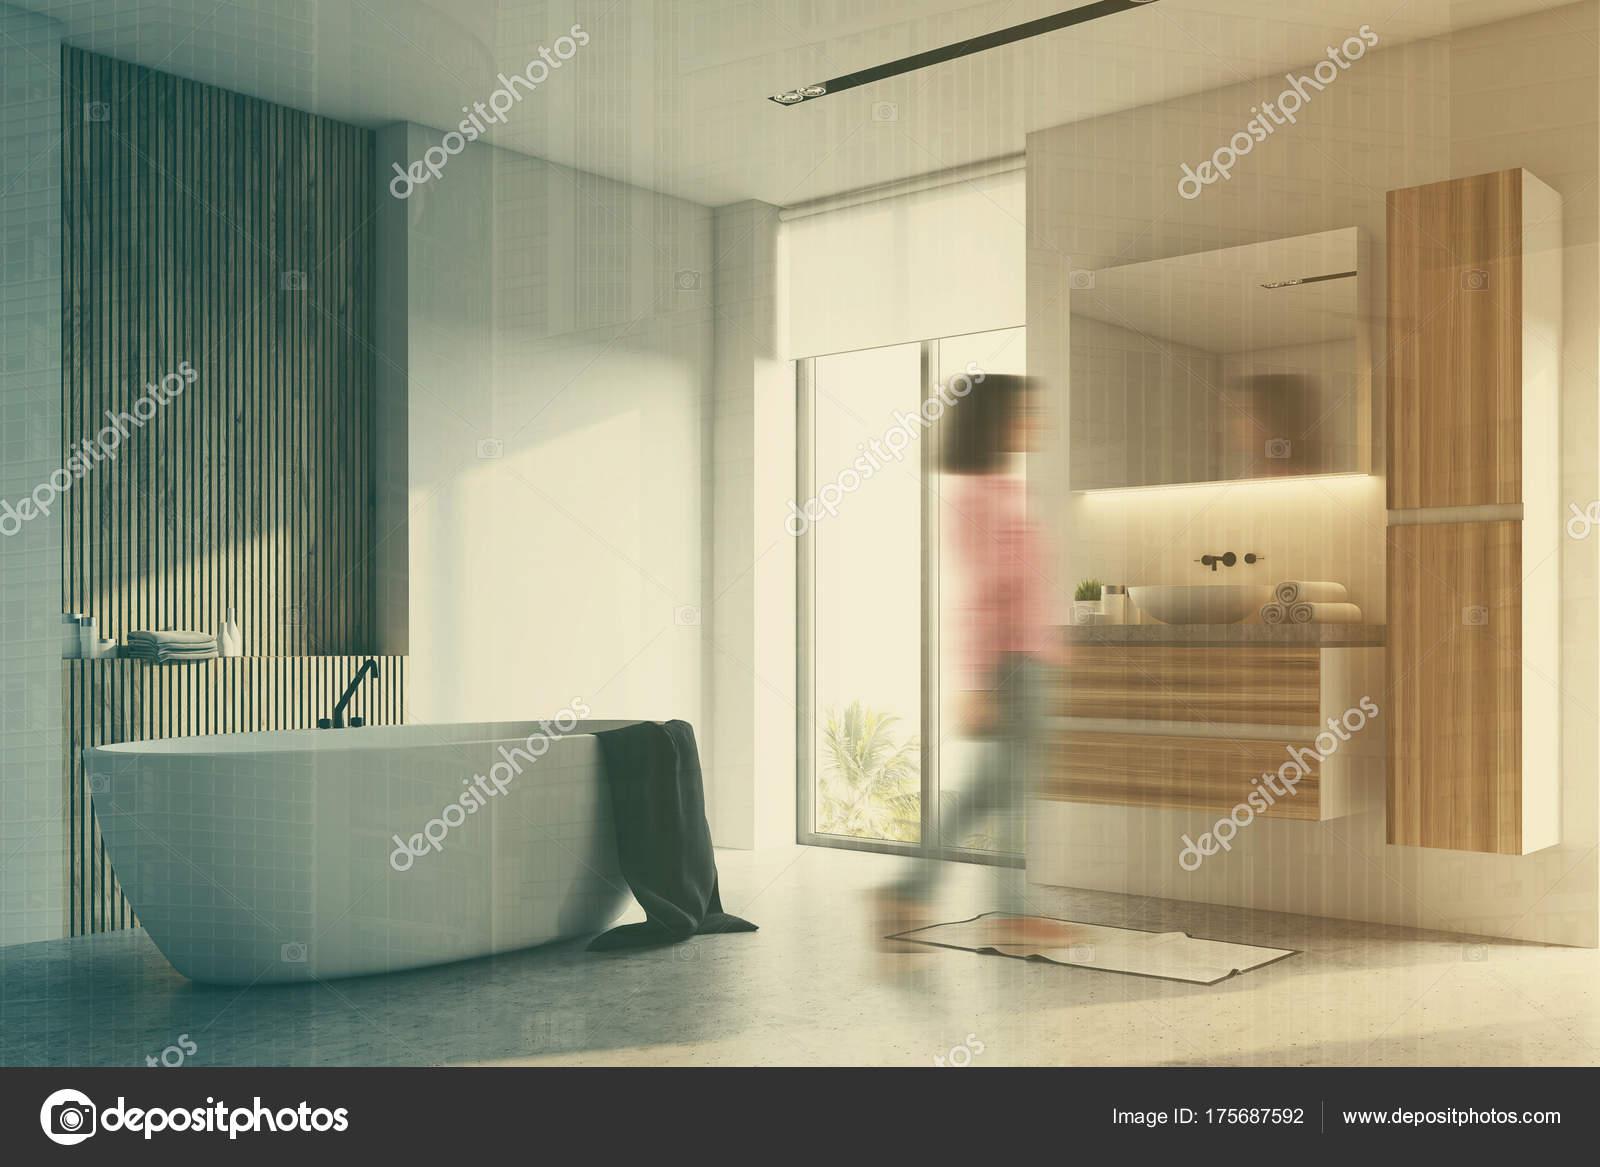 https://st3.depositphotos.com/2673929/17568/i/1600/depositphotos_175687592-stockafbeelding-zwart-en-houten-badkamer-hoek.jpg